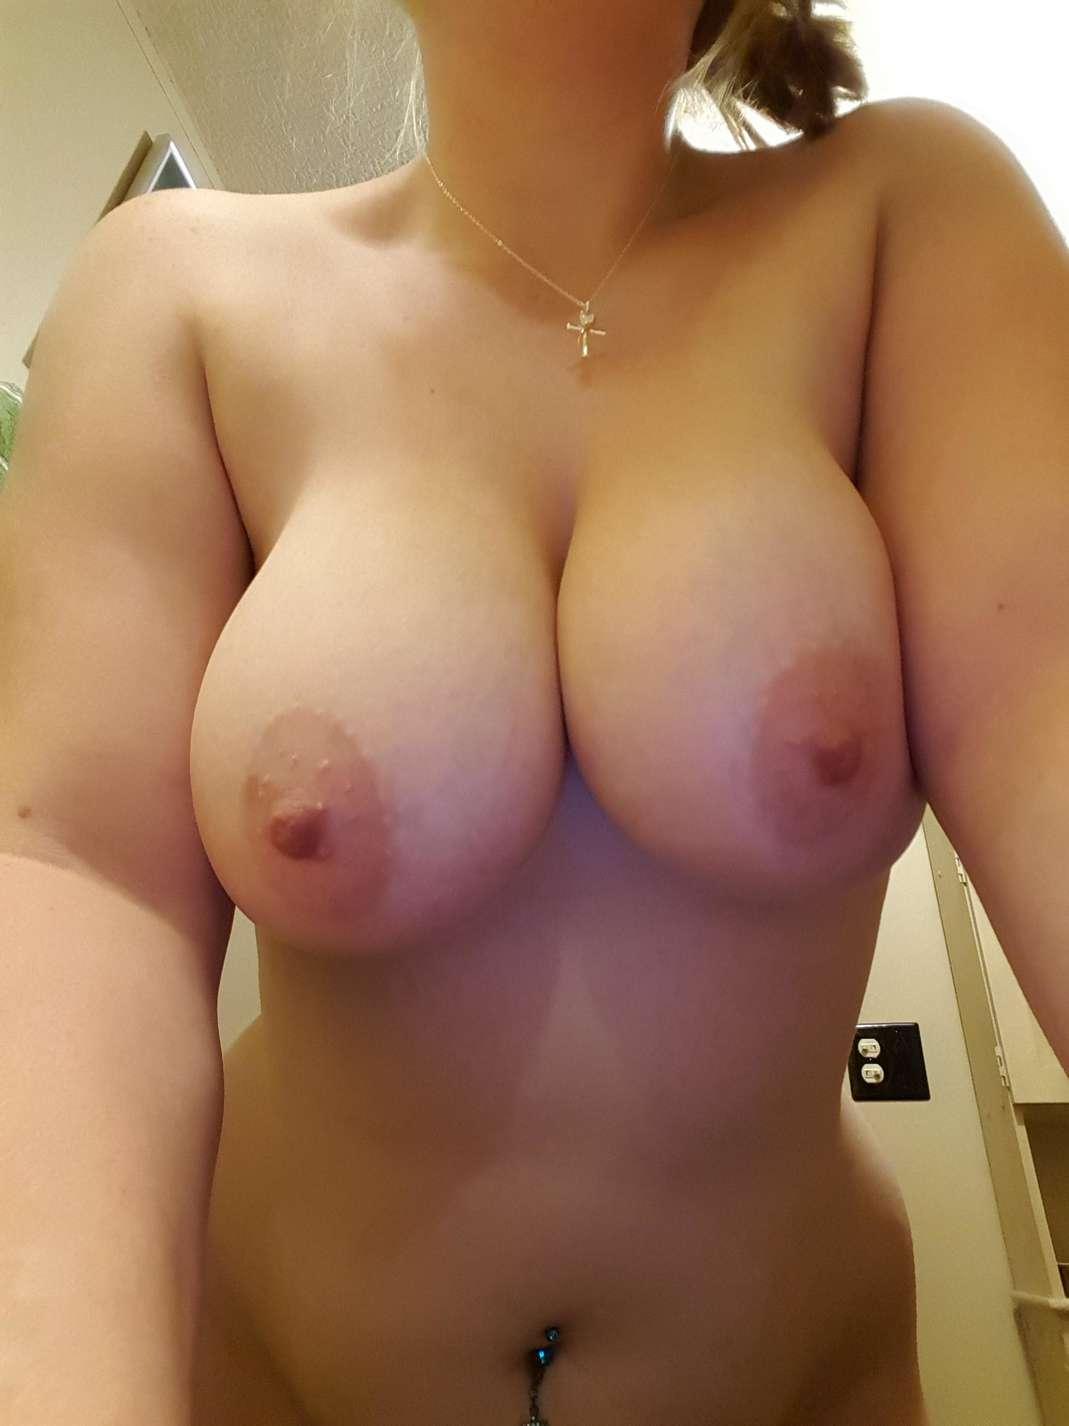 amatrice gros seins selfies (9)